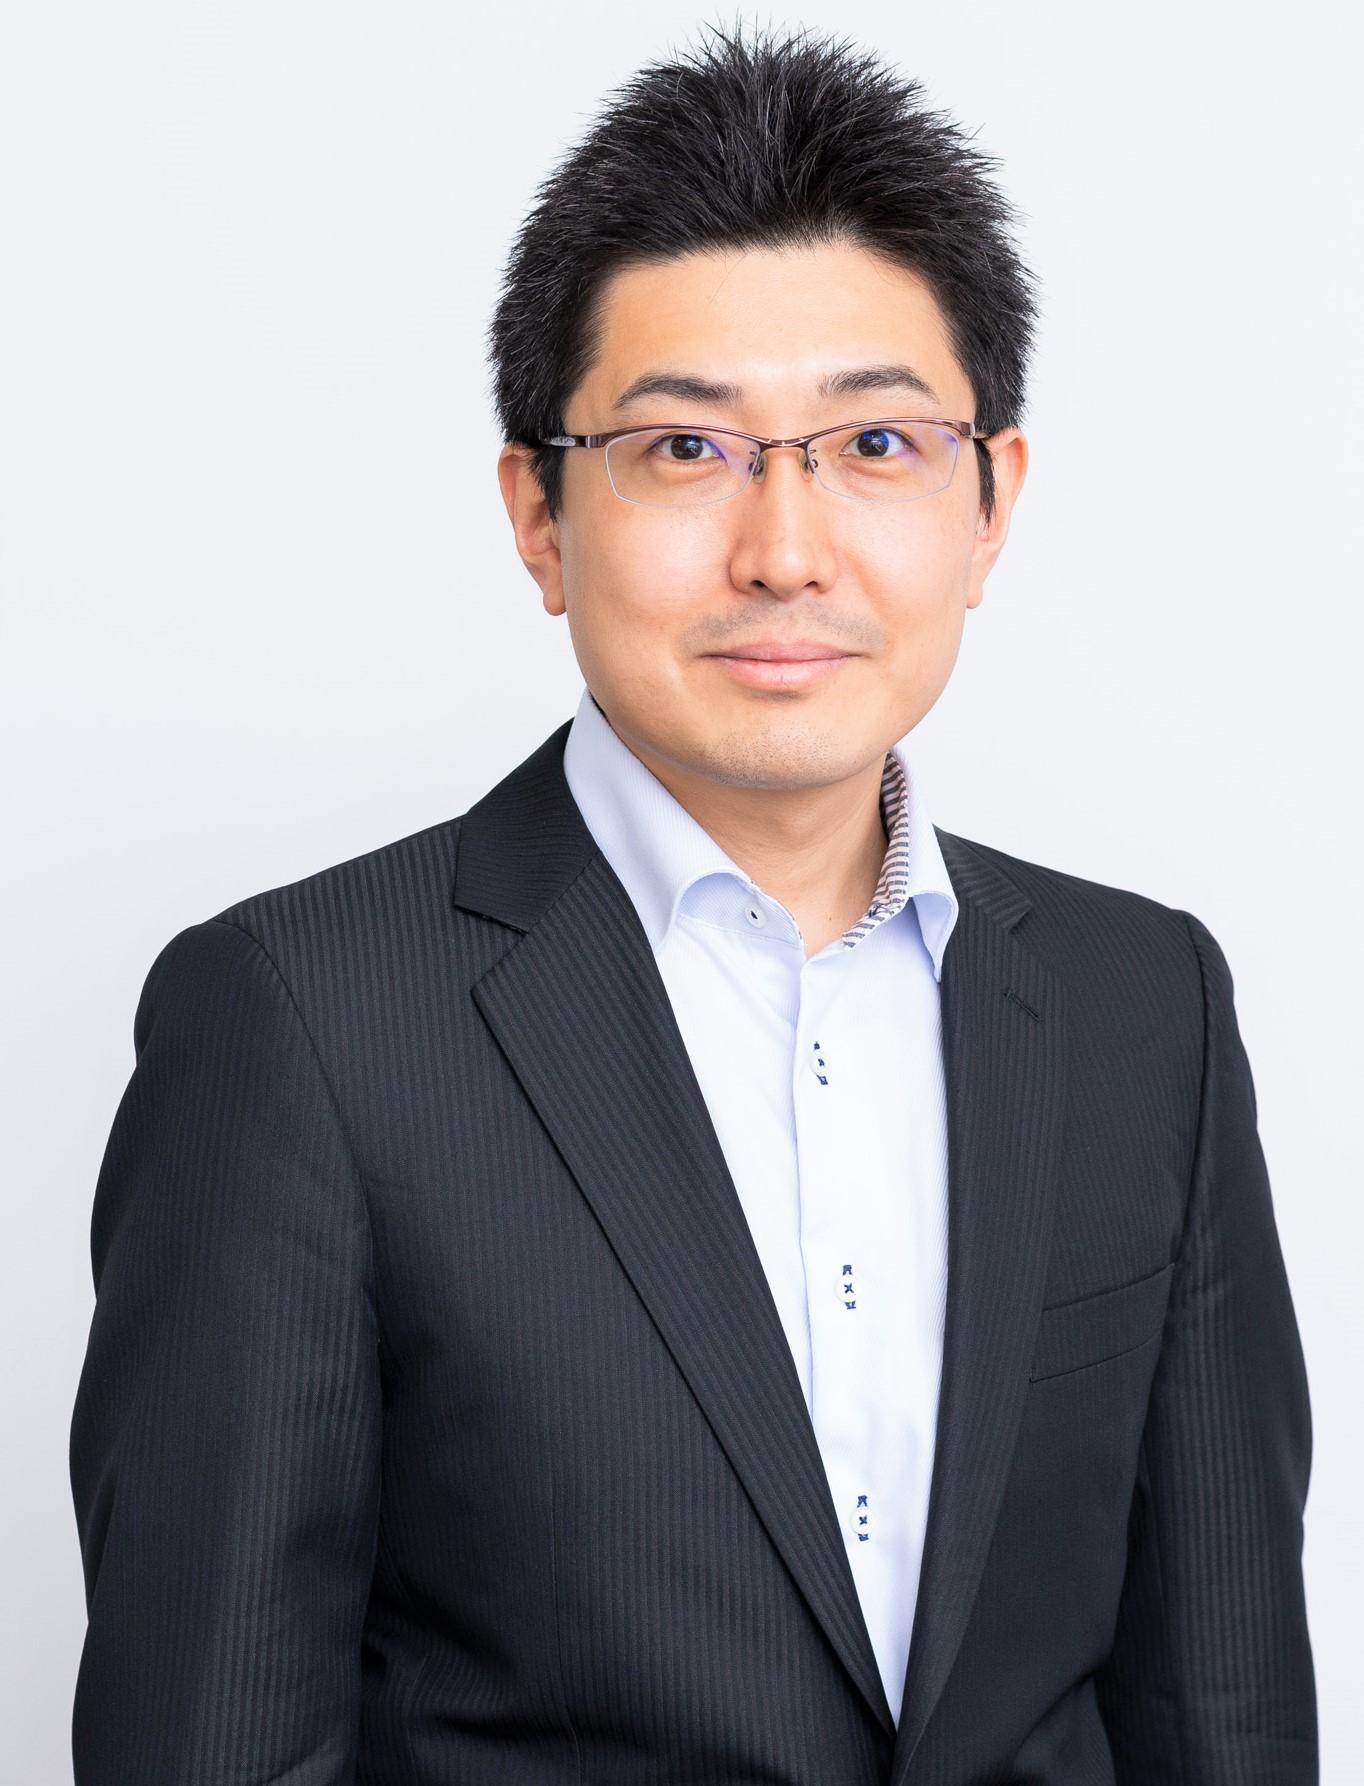 Yuta Toyama